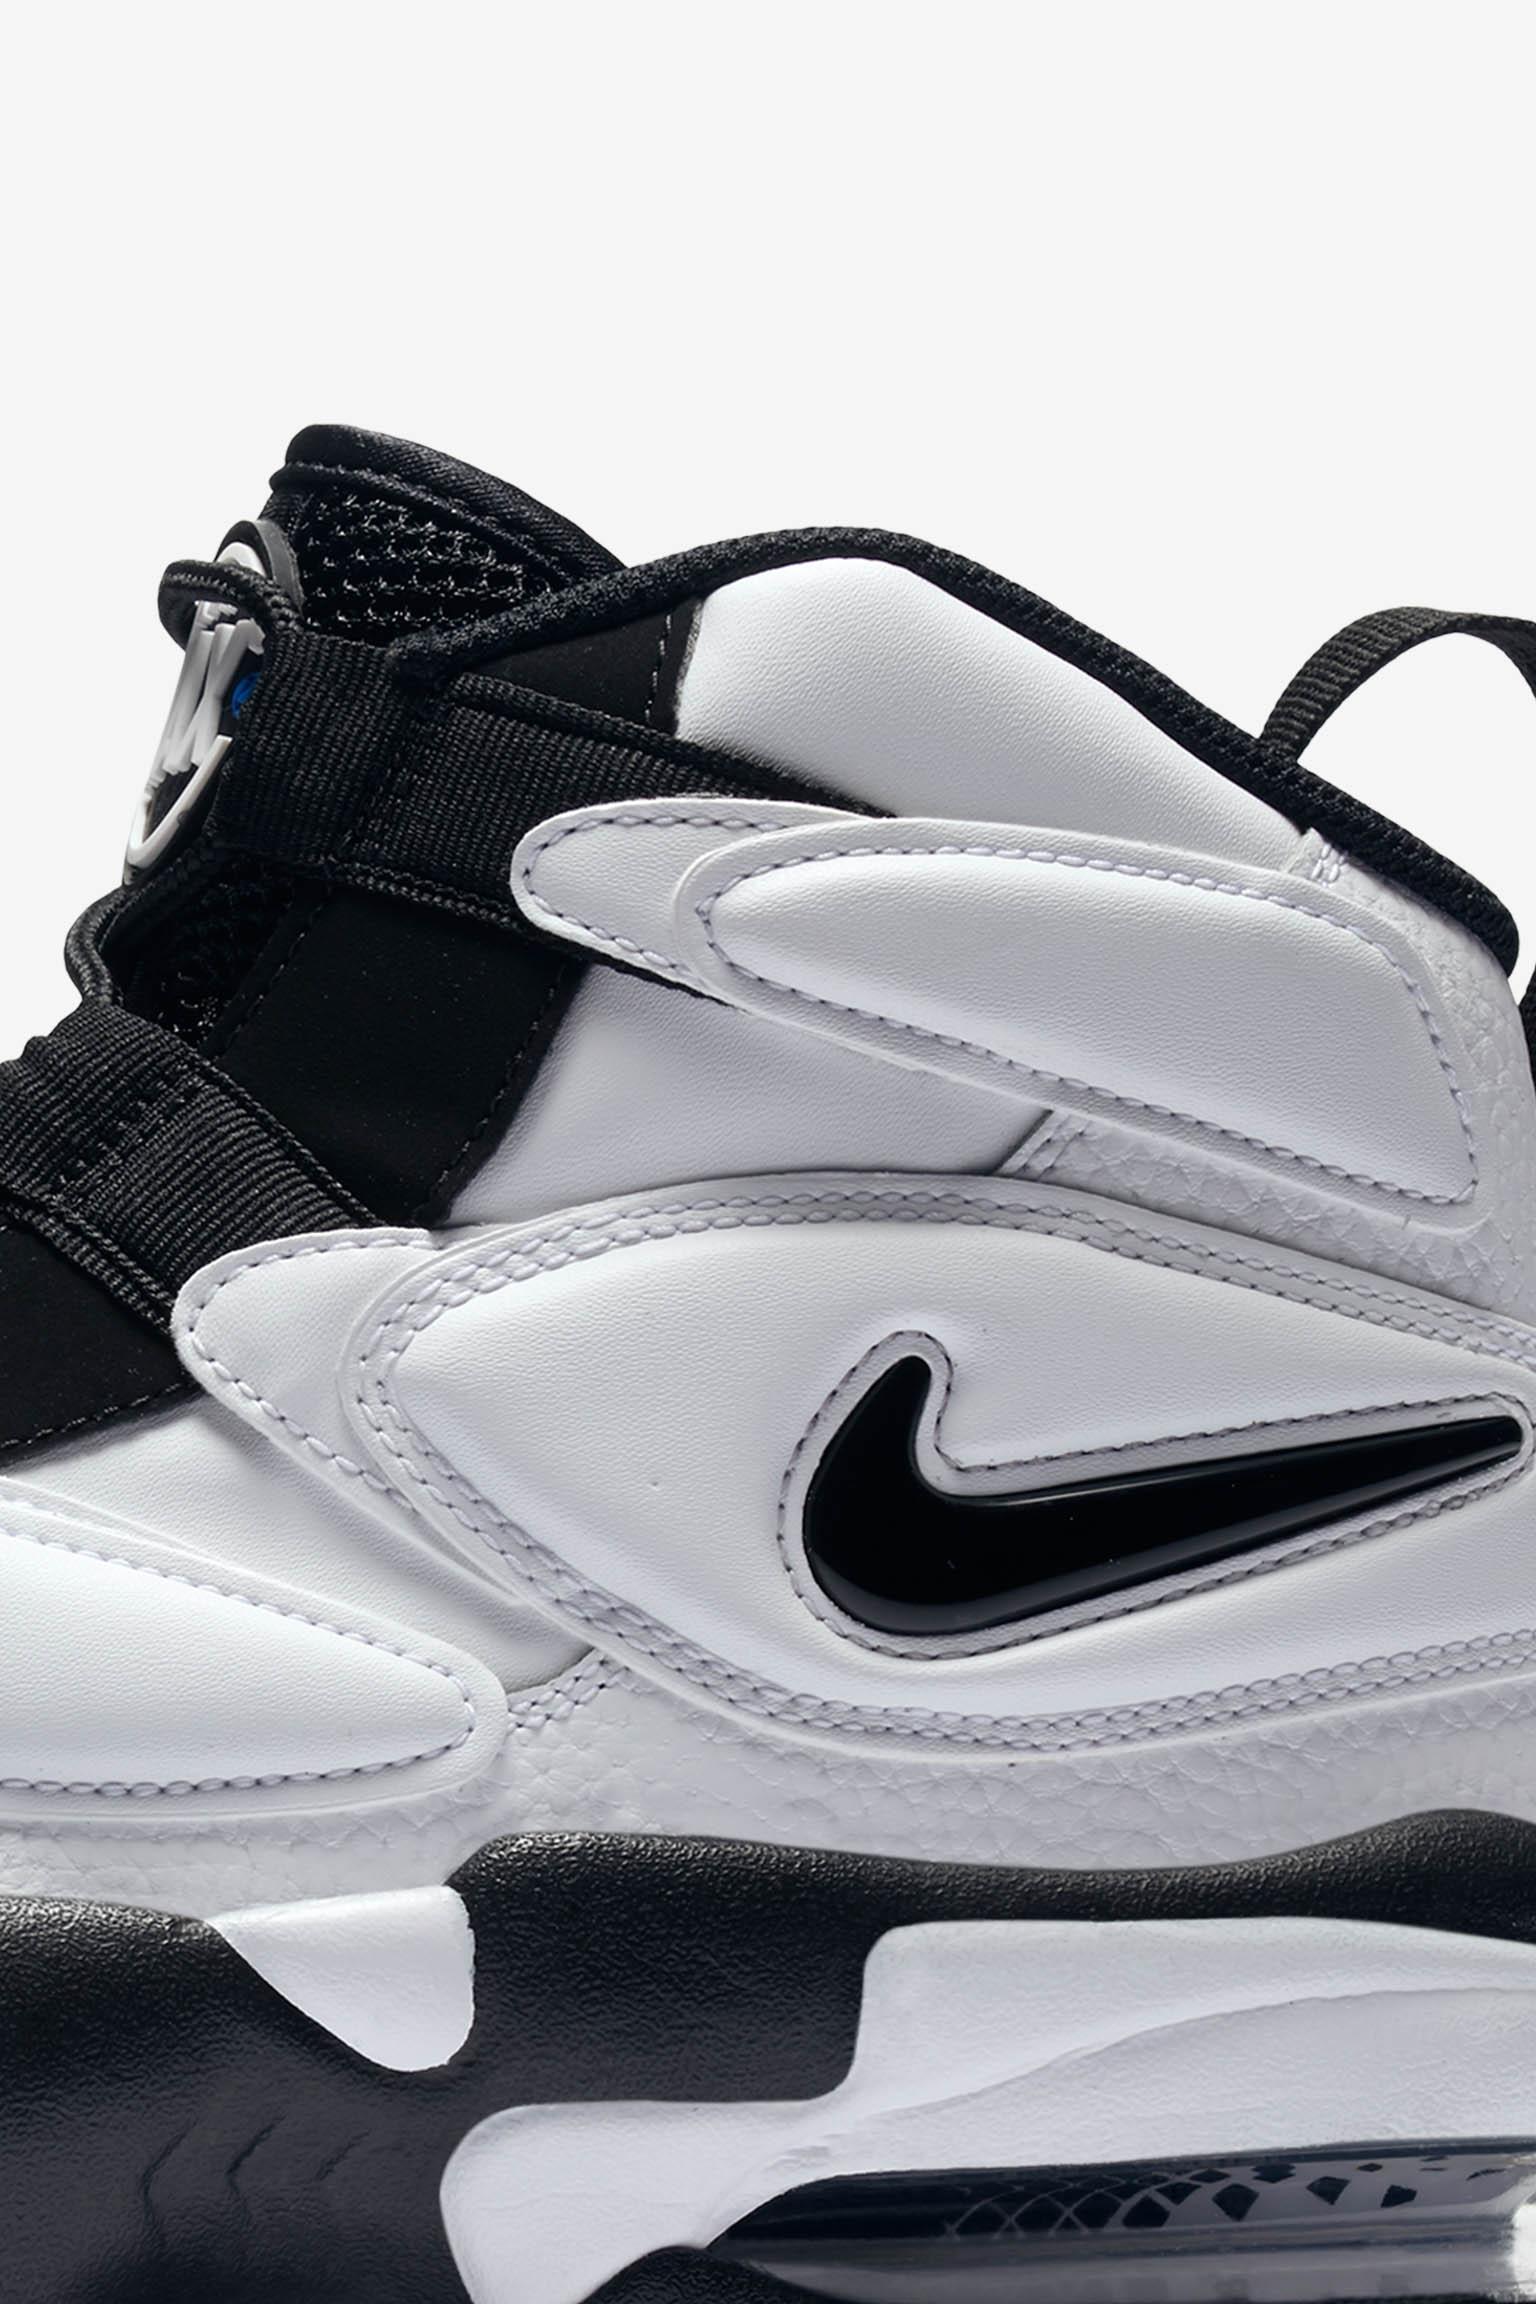 NIKE AIR MAX2 UPTEMPO white black 1